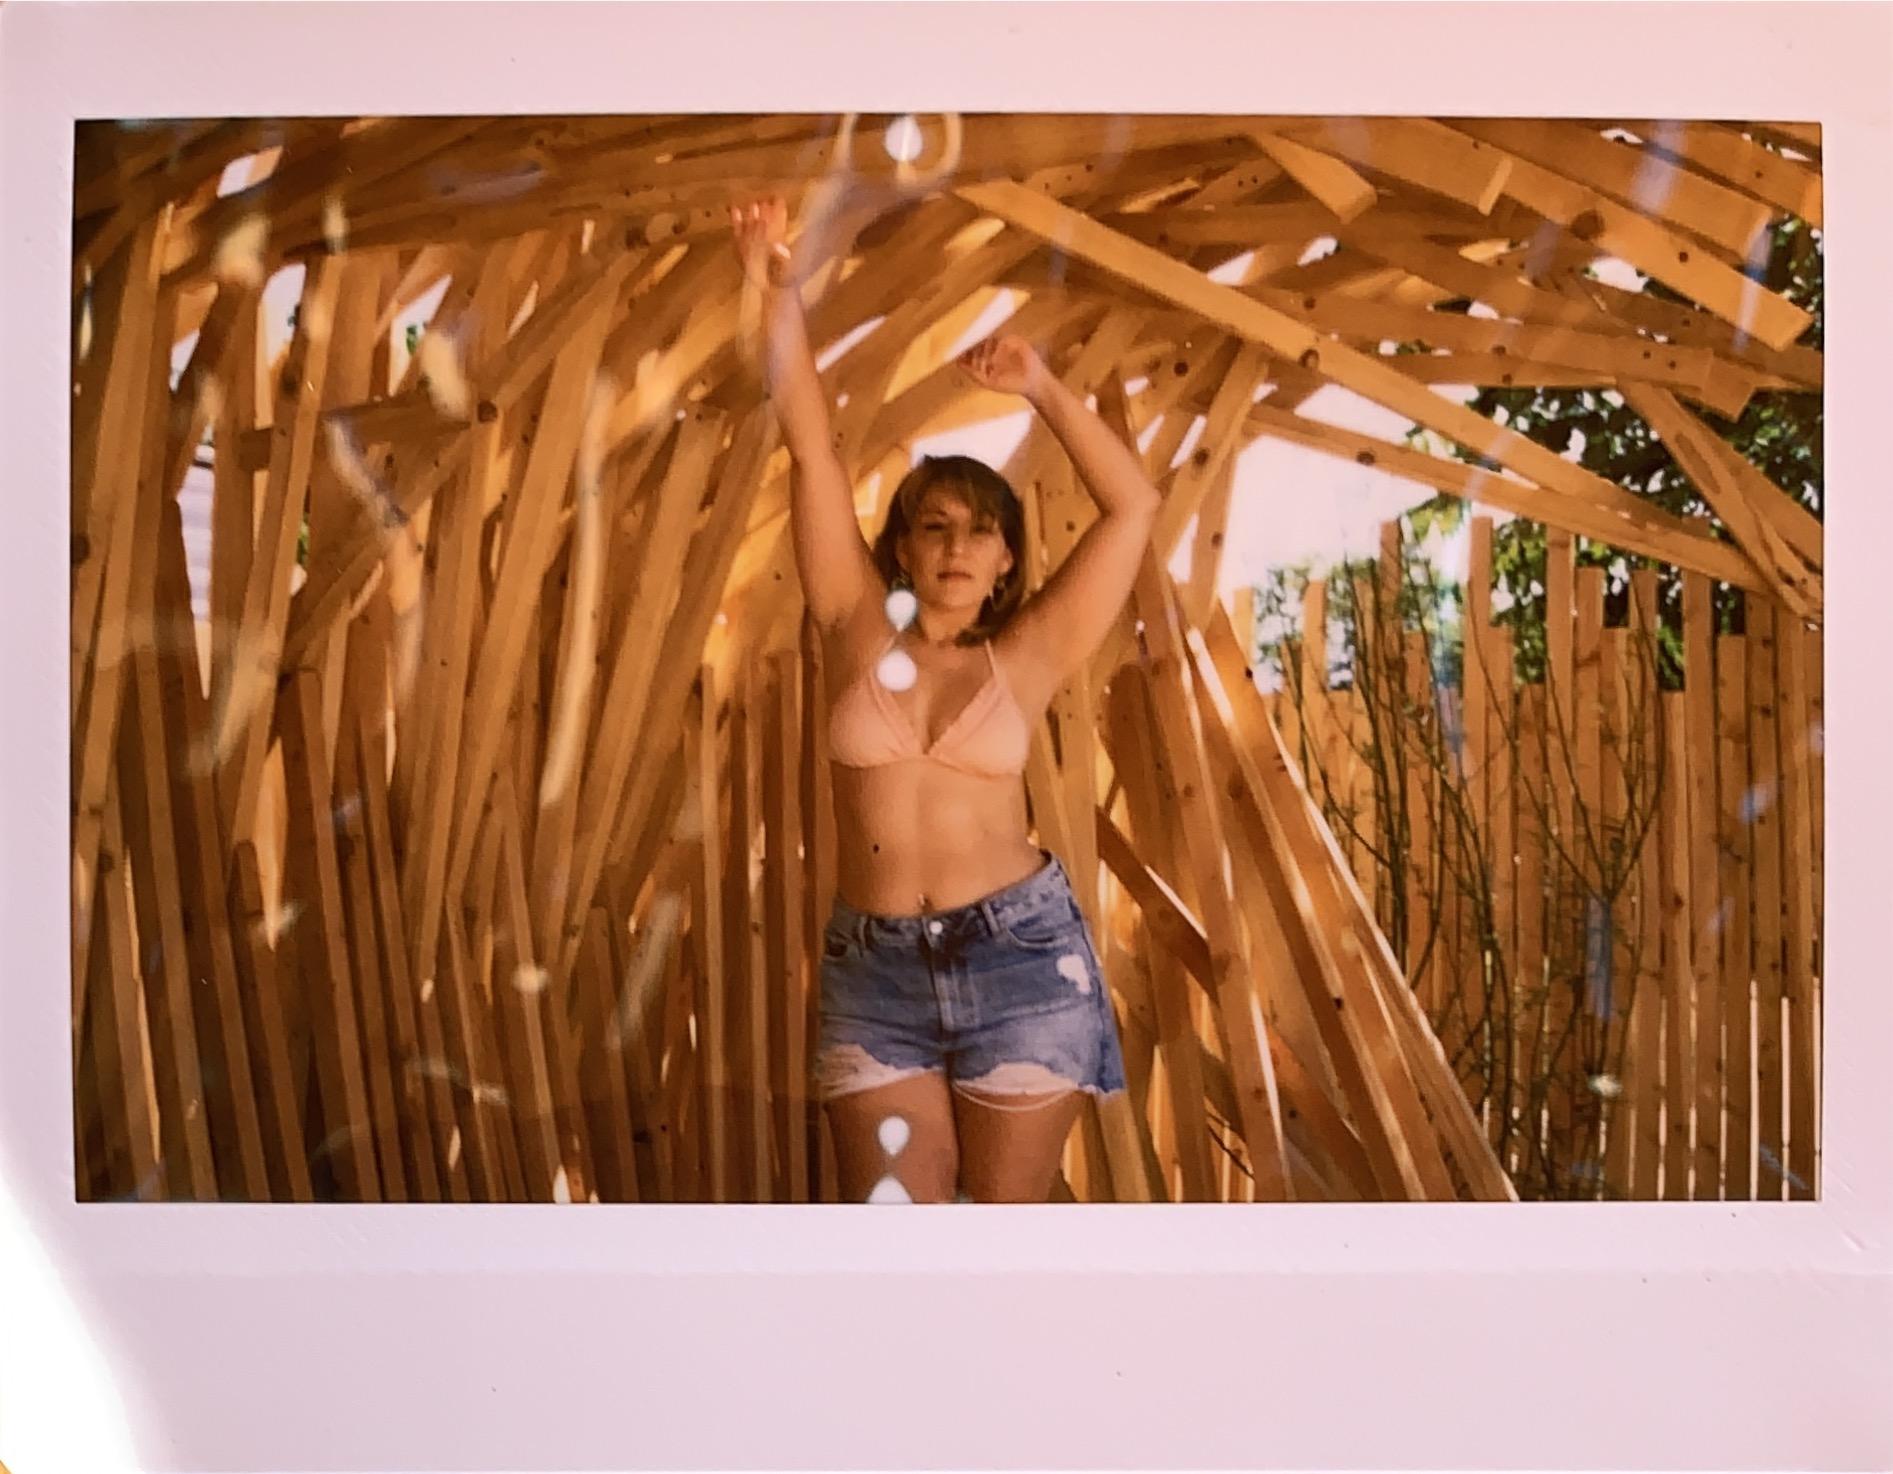 airbnb-art loft-joshua tree - polaroid 2.JPG